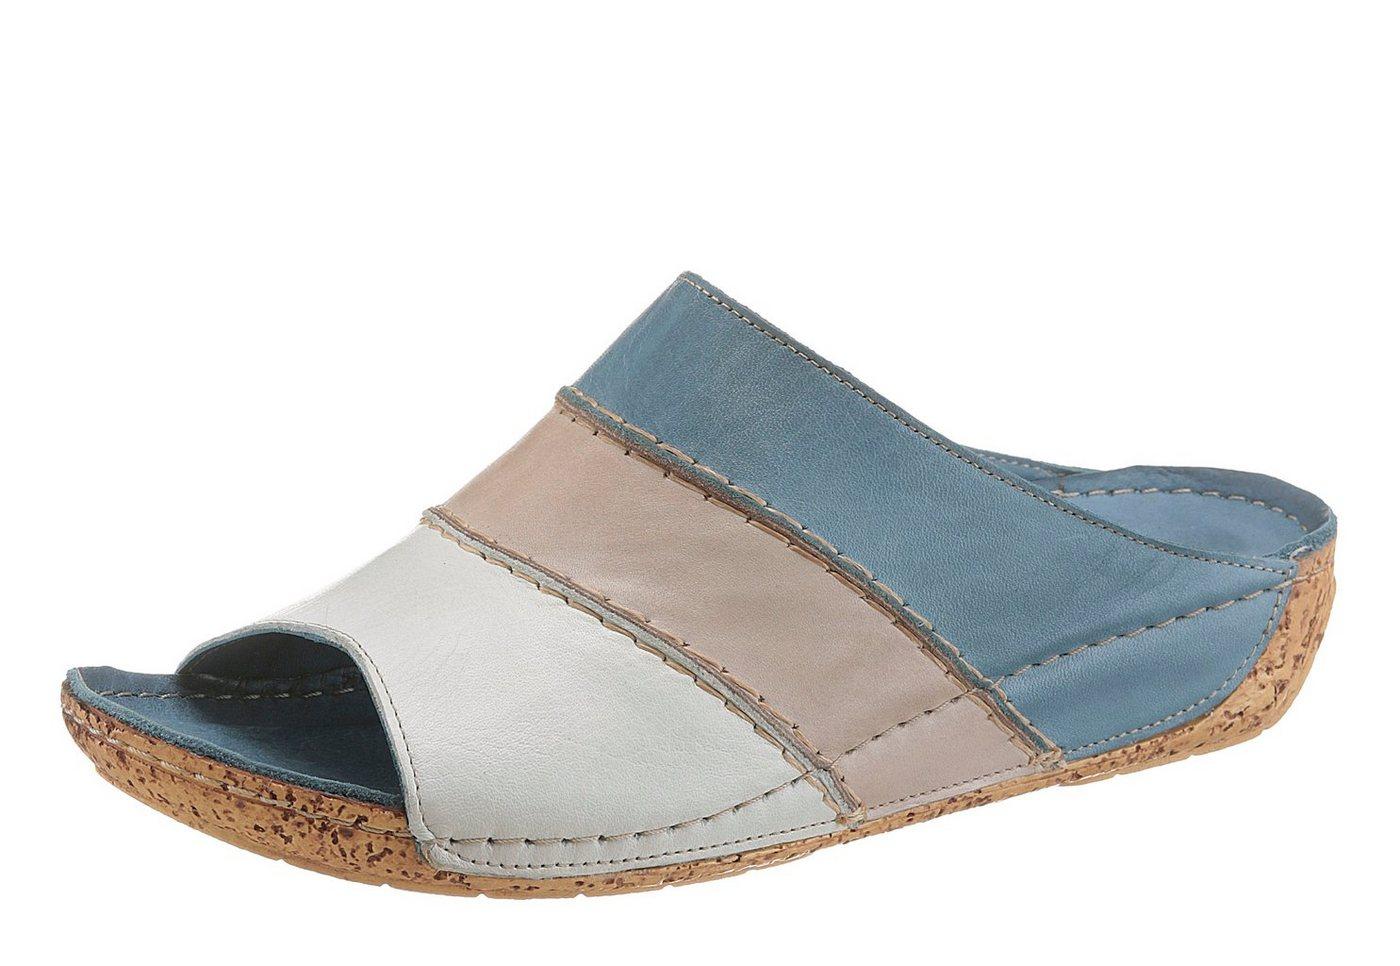 Gemini Keilpantolette in Patchwork-Optik   Schuhe > Clogs & Pantoletten > Keilpantoletten   Blau   Gemini